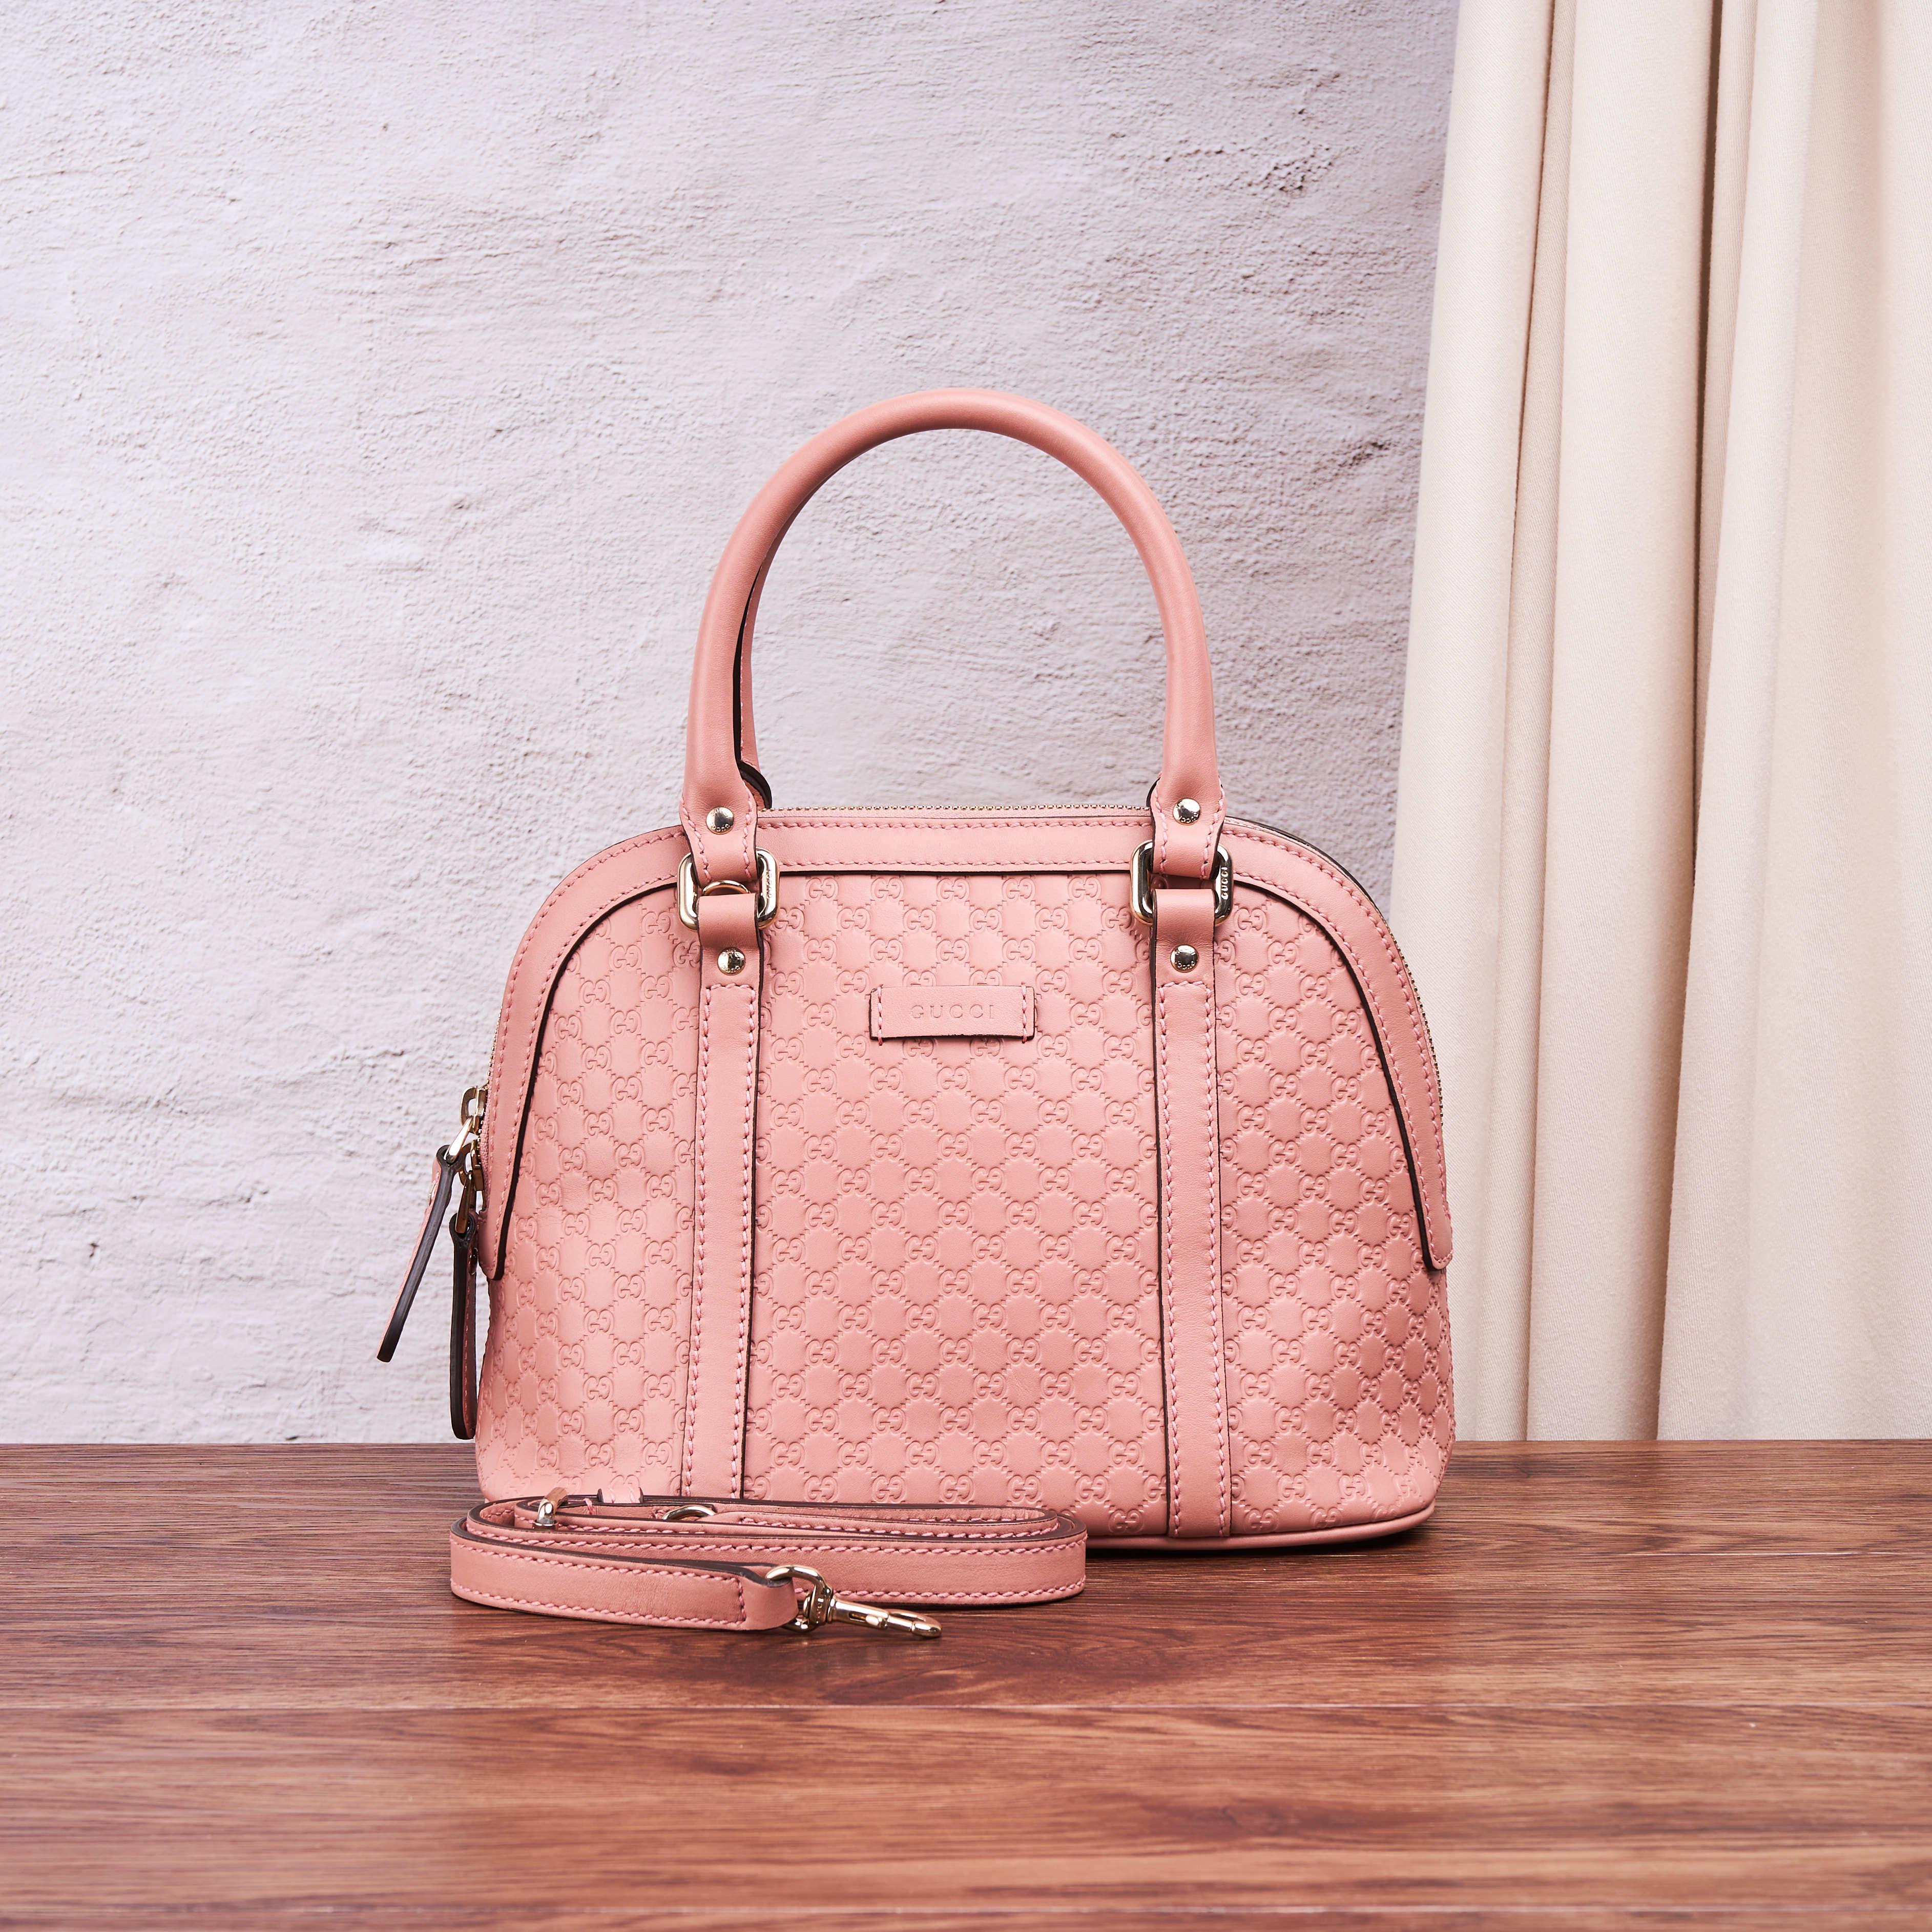 gucci贝壳包 临时【95新】Gucci粉色贝壳包 24.10.18 牛皮 公价 ¥12000_推荐淘宝好看的gucci贝壳包